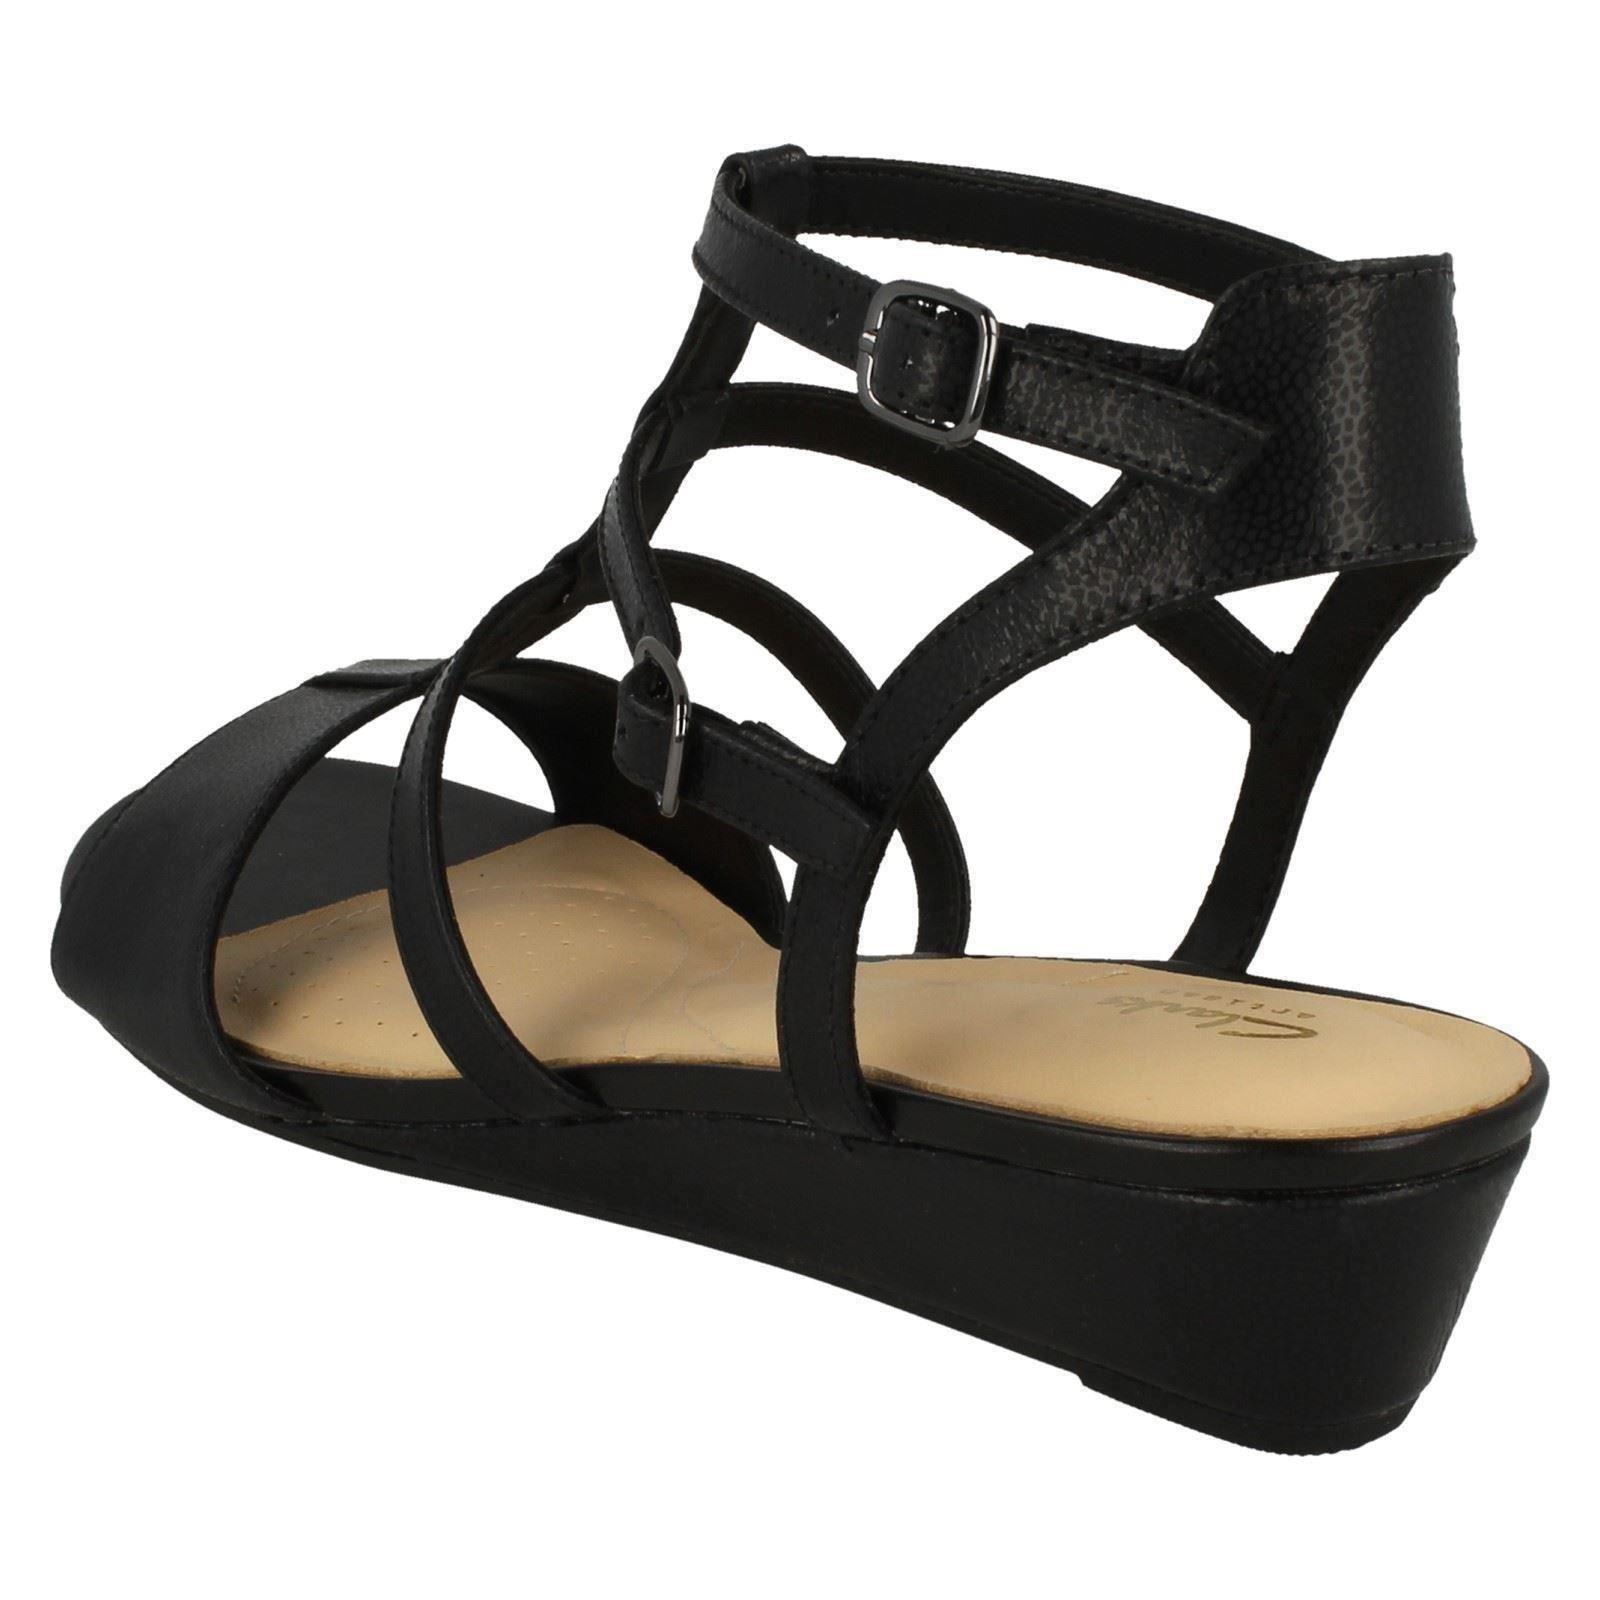 f9bbf30cf60 Clarks Parram Spice - Black Nubuck Womens Sandals 5 UK for sale ...